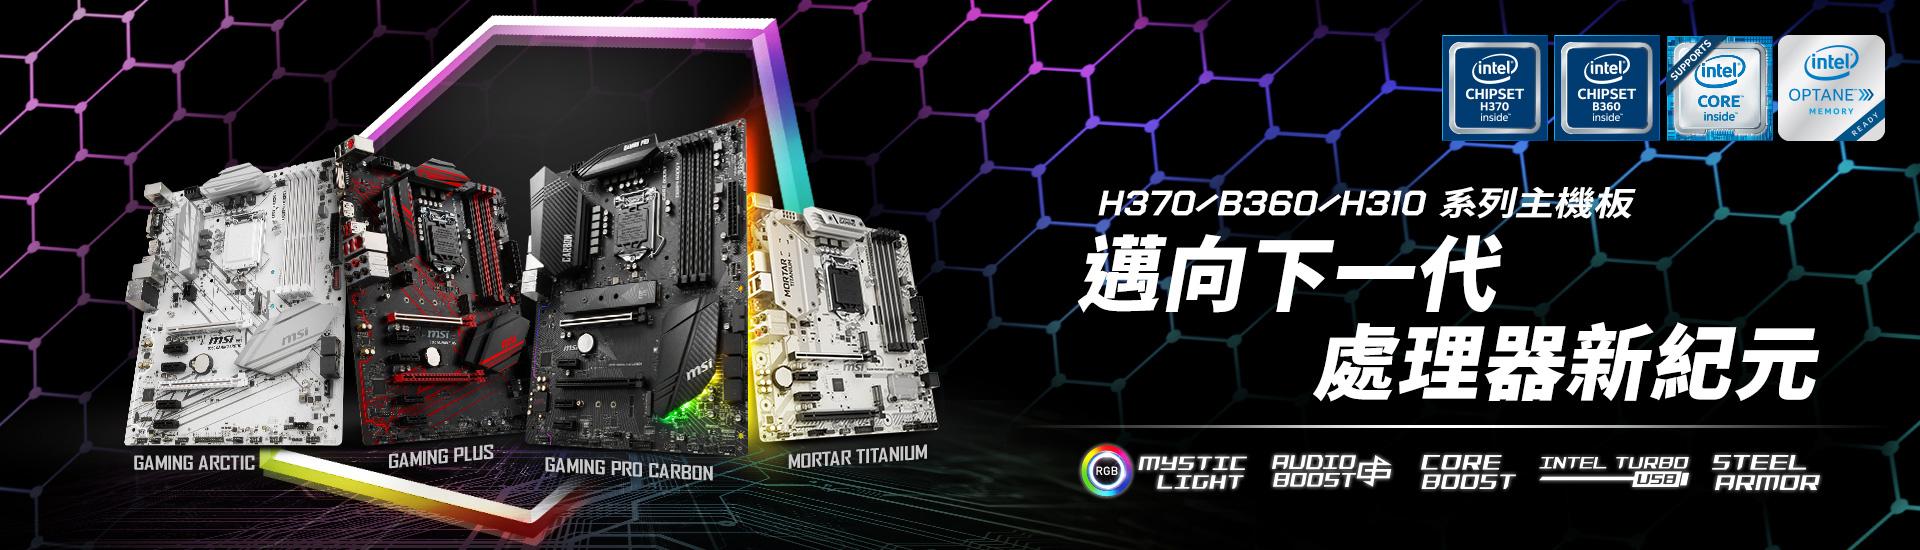 H370 / B360